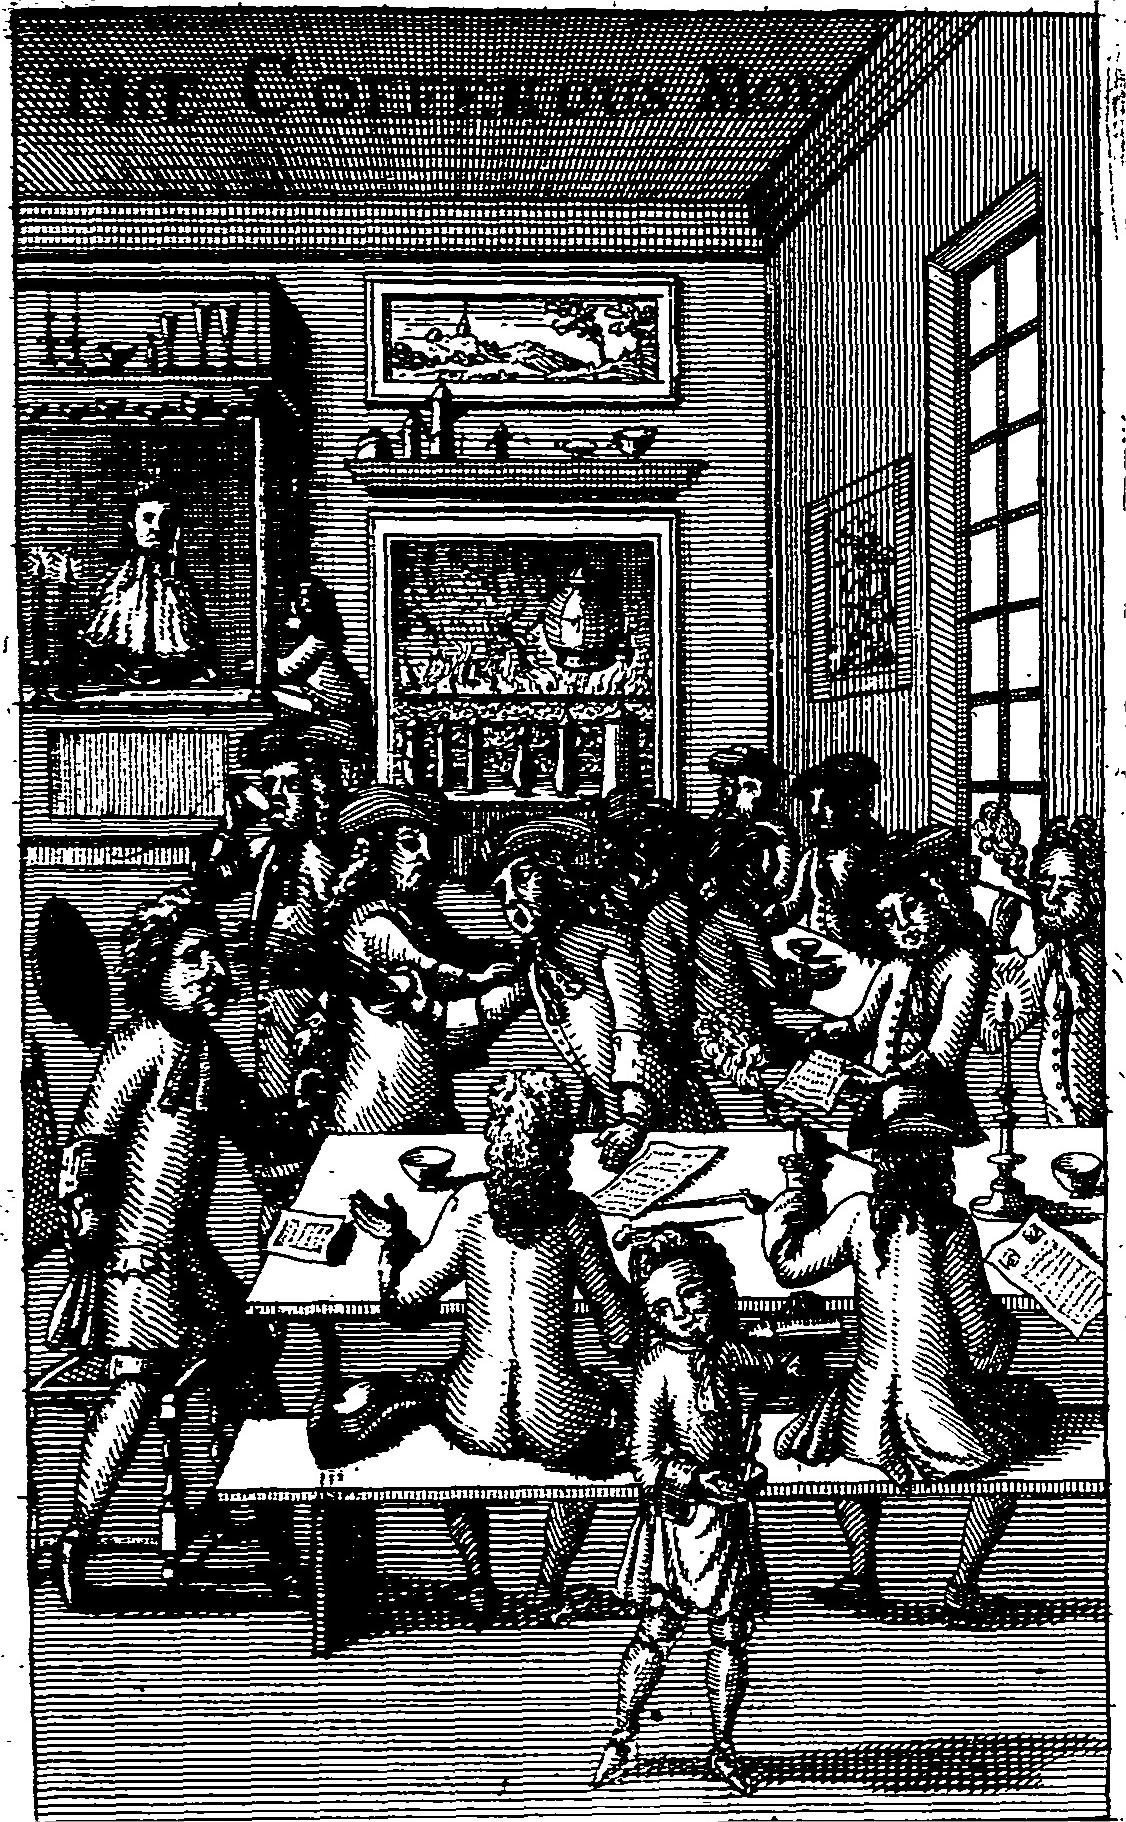 London Spy (author) 1710